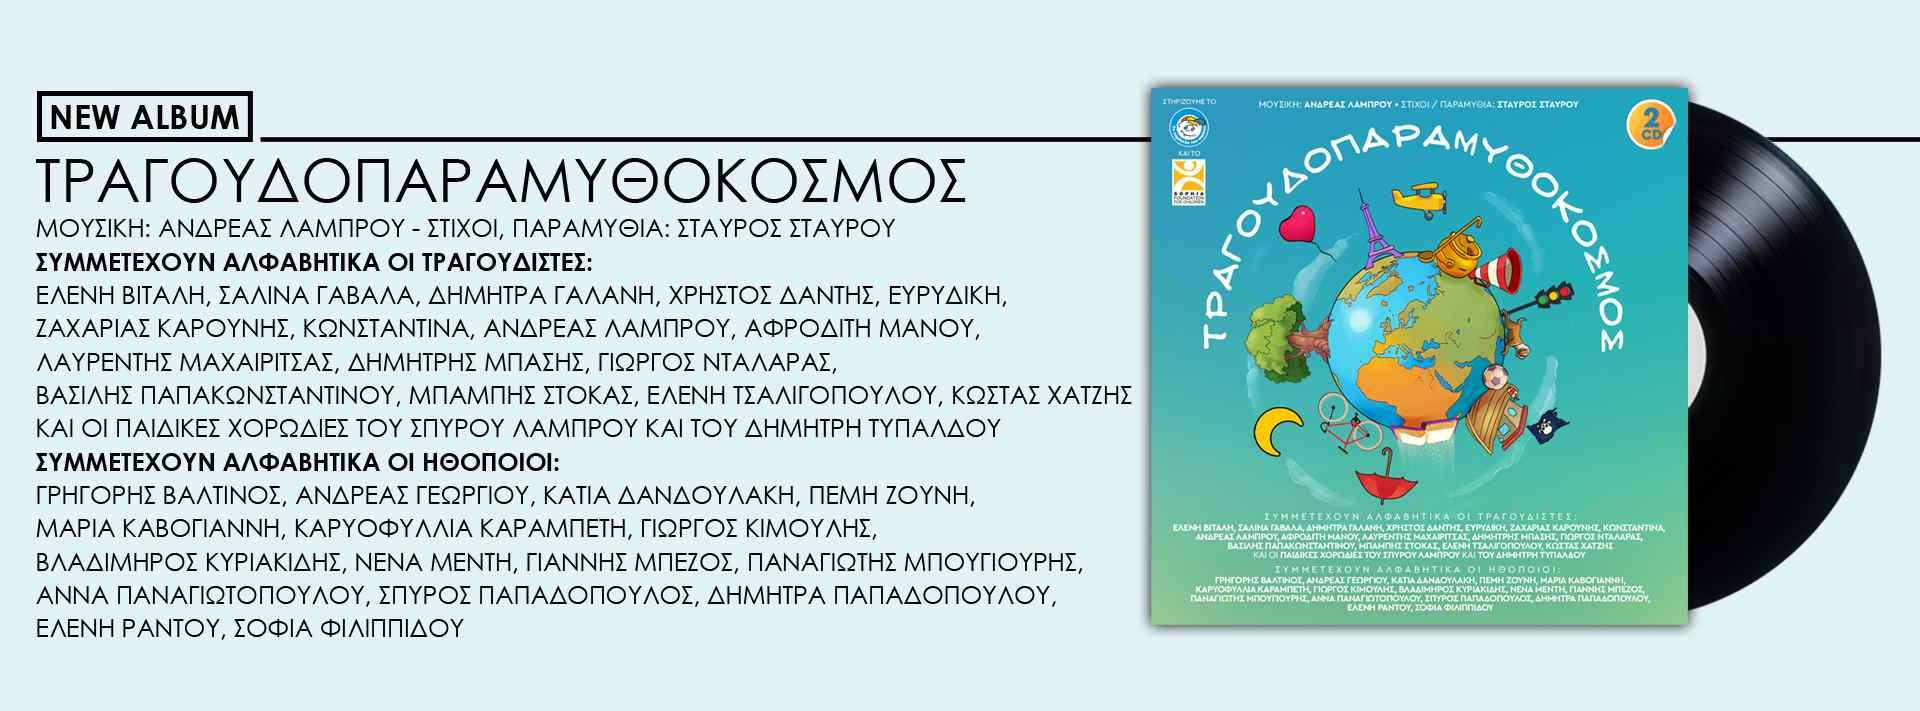 tragoudoparamythokosmos_banner